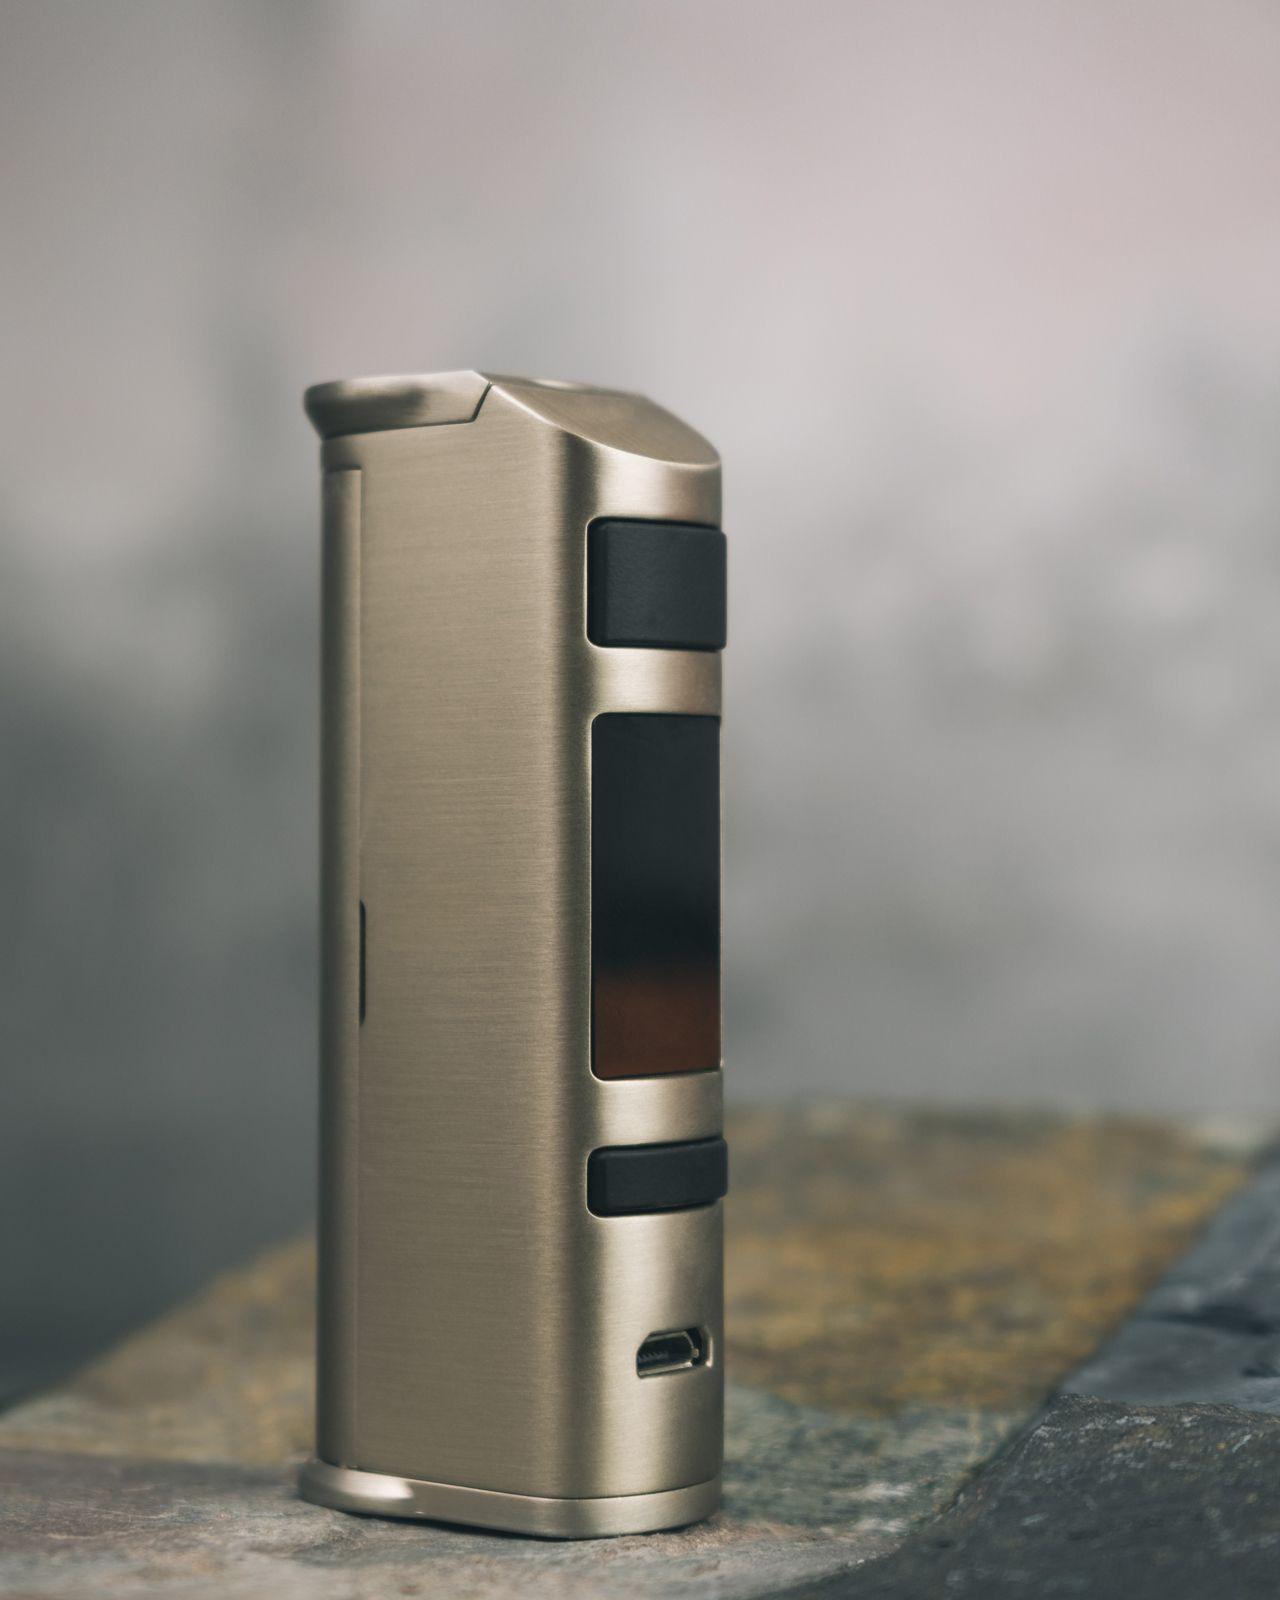 SERIES-B DNA 75W 23mm Black Edition